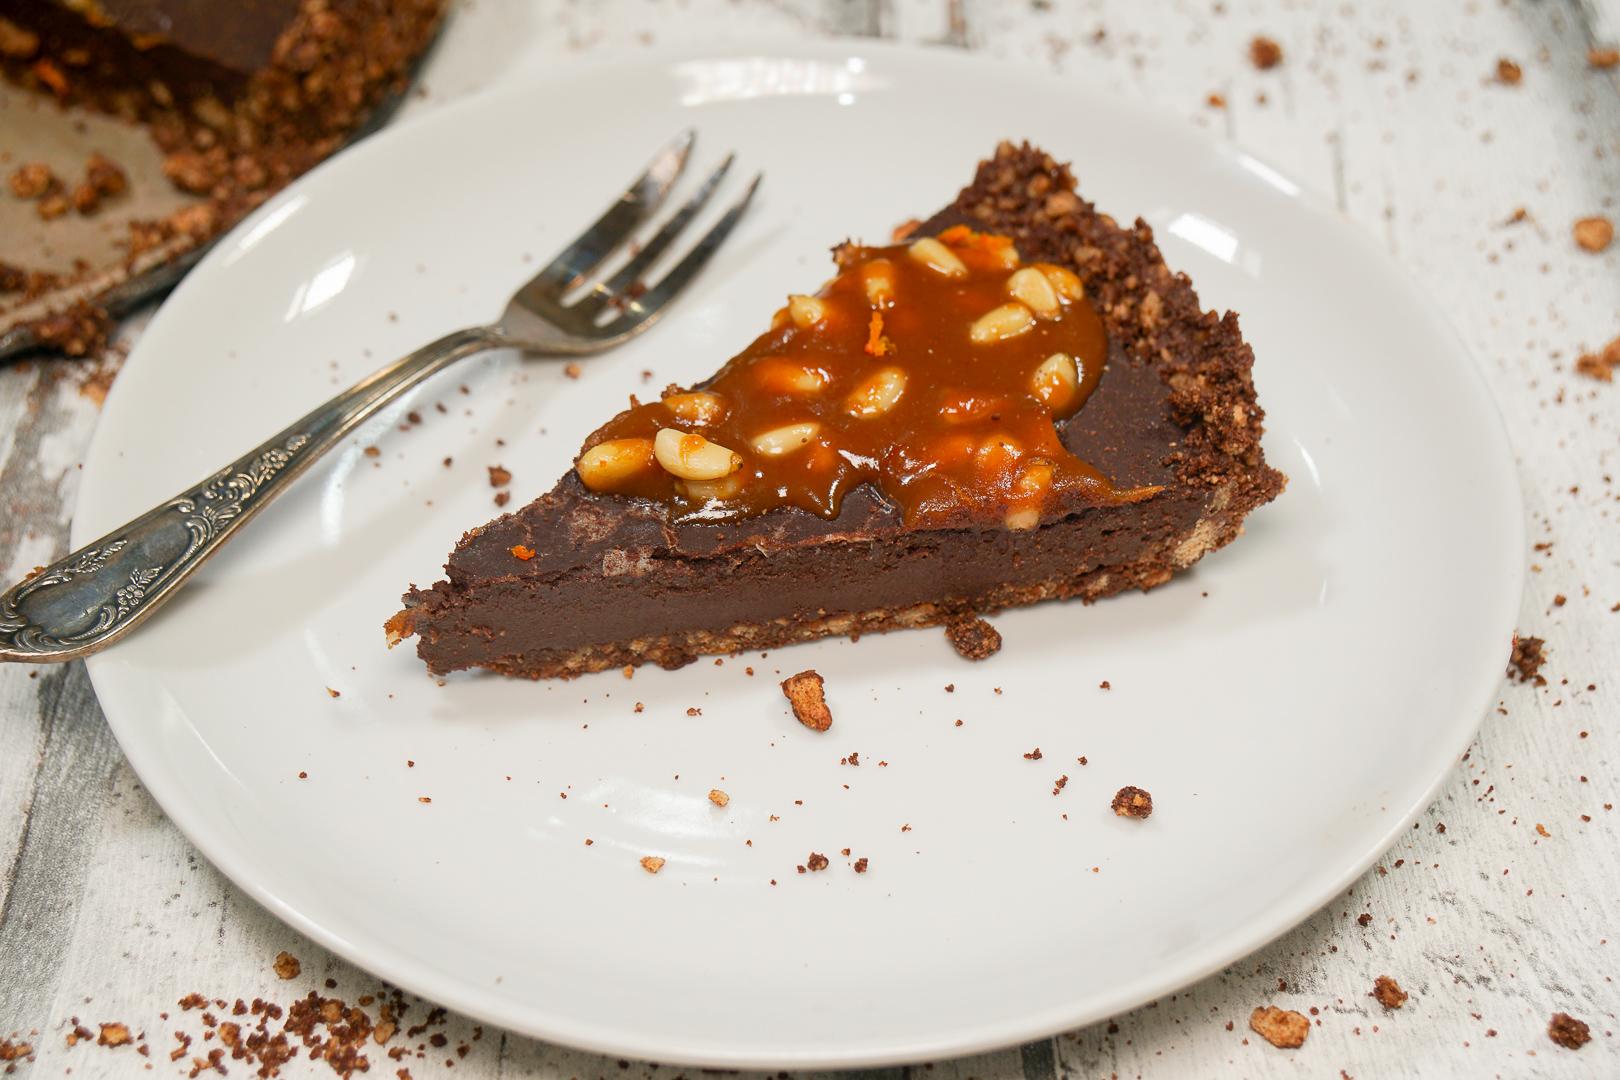 schokoladen karamell tarte nat rlich lecker. Black Bedroom Furniture Sets. Home Design Ideas